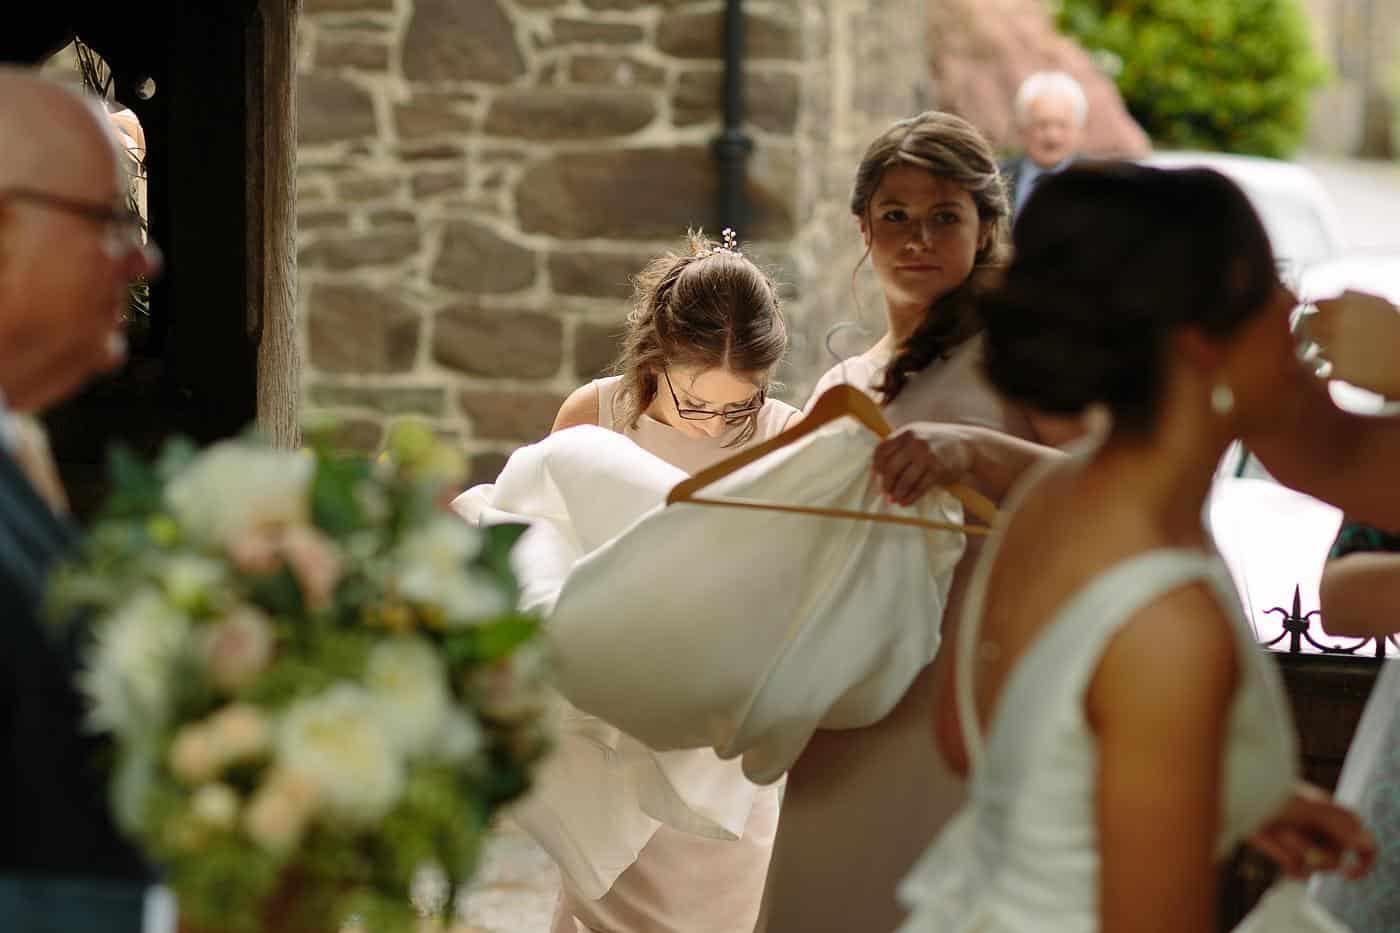 Winstanstow wedding photography 0325